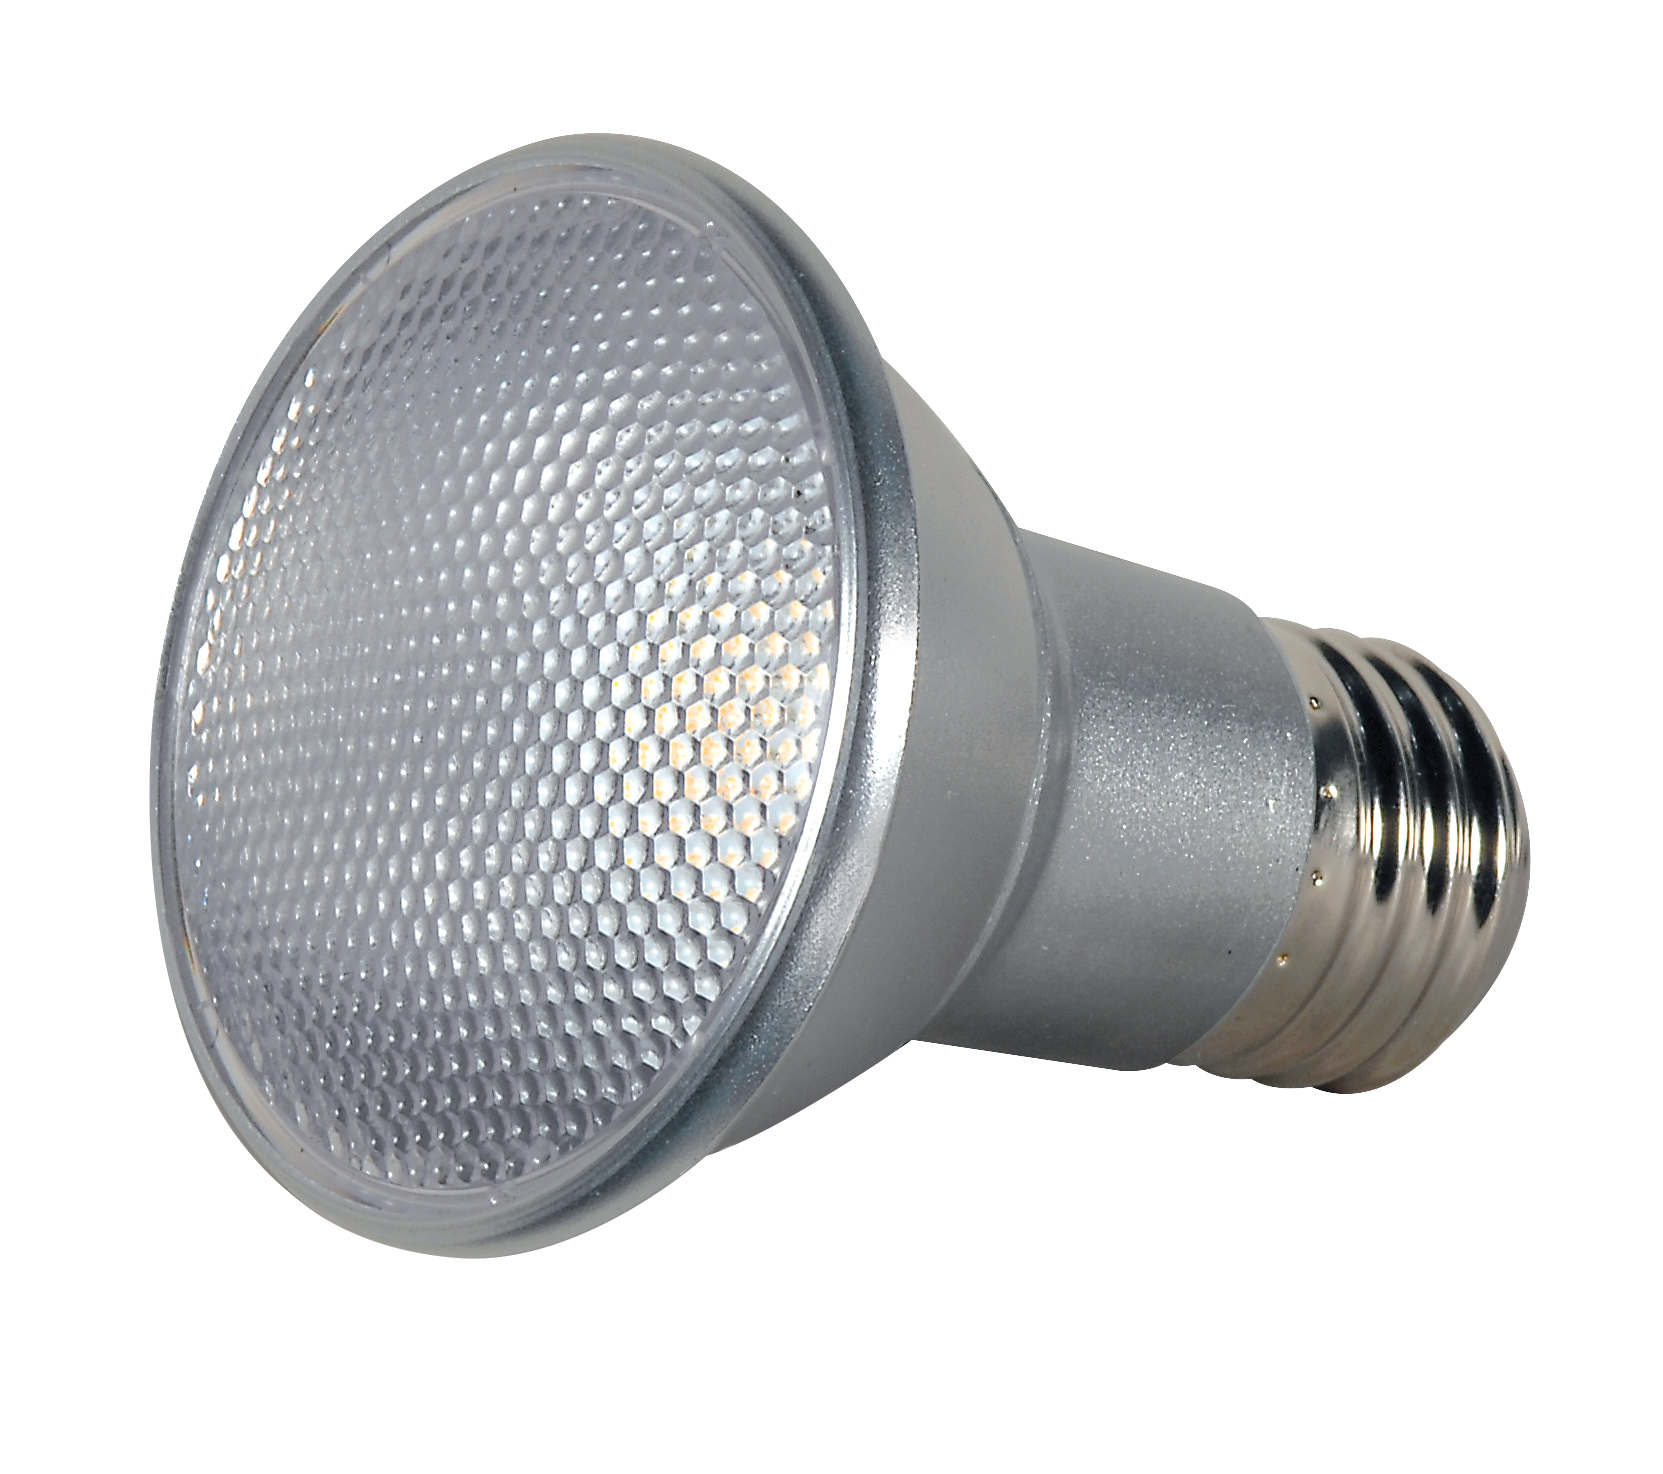 Satco,S9405,SATCO® S9405 Dimmable LED Reflector Lamp, 7 W, LED Lamp, E26 Medium Lamp Base, PAR20 Shape, 525 Lumens Initial